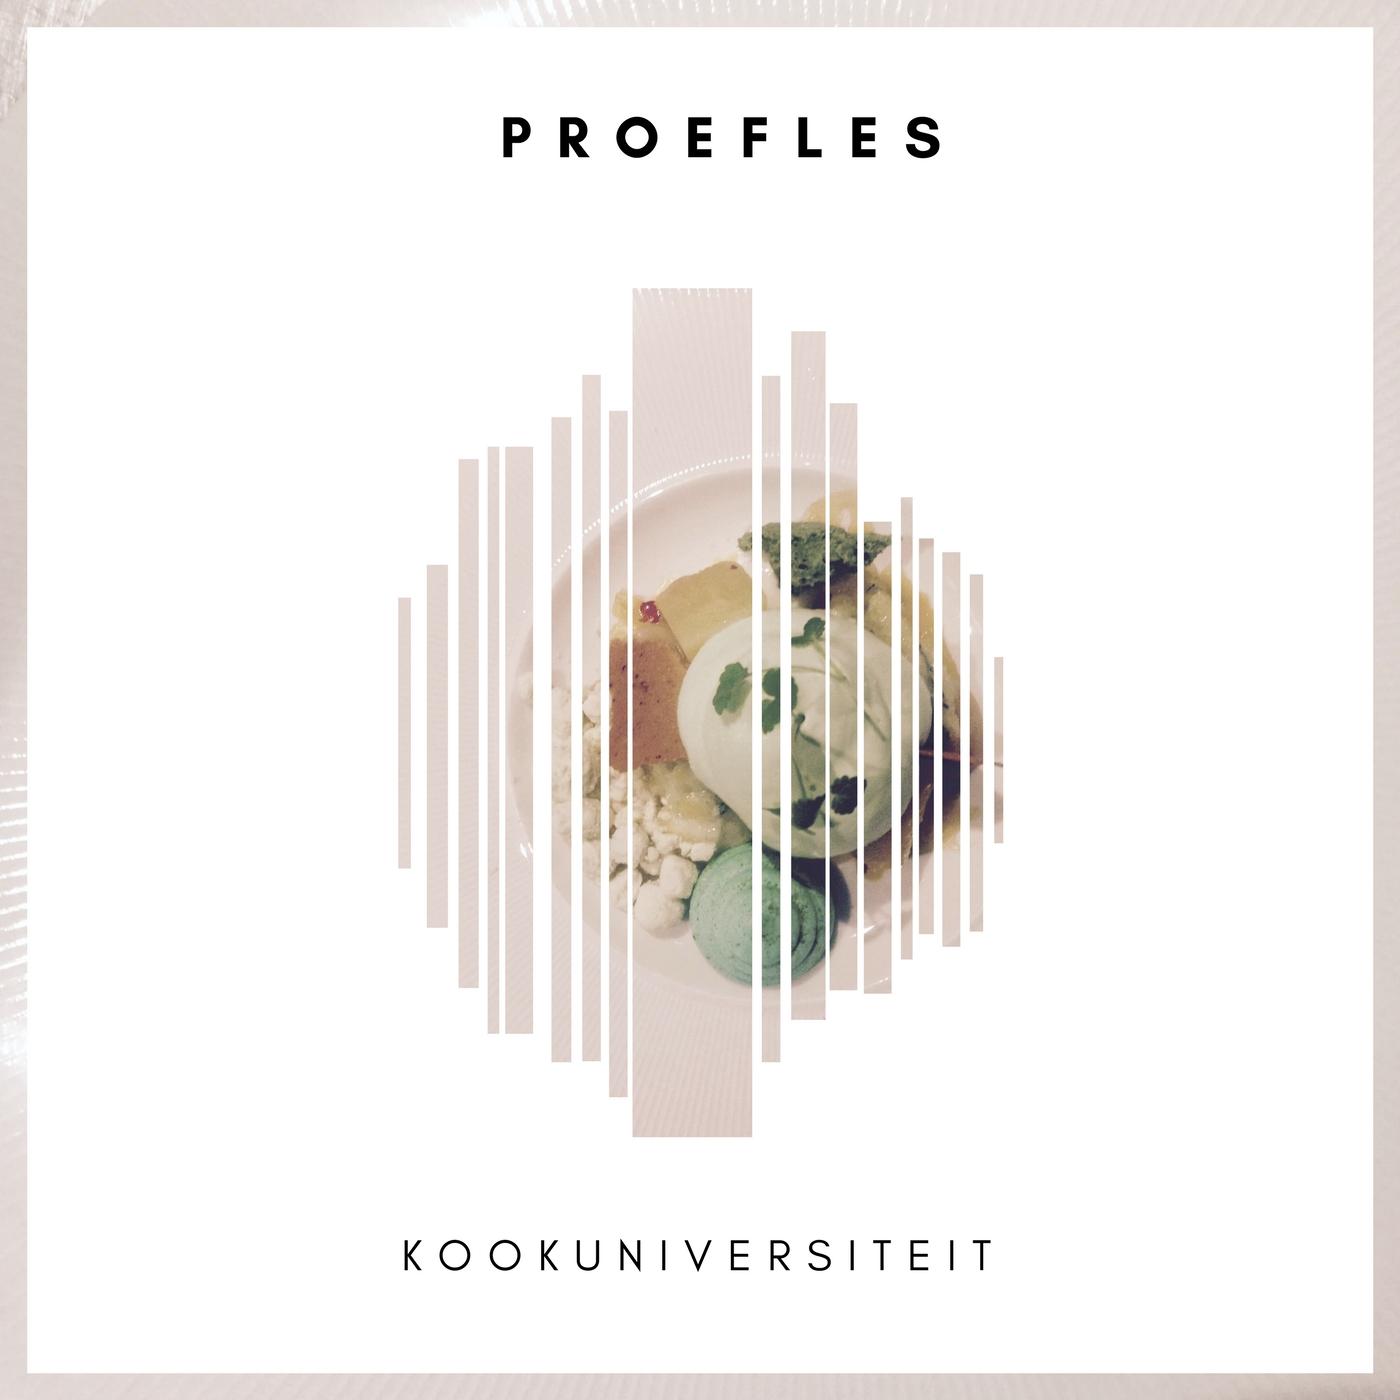 Proefles - Kookuniversiteit